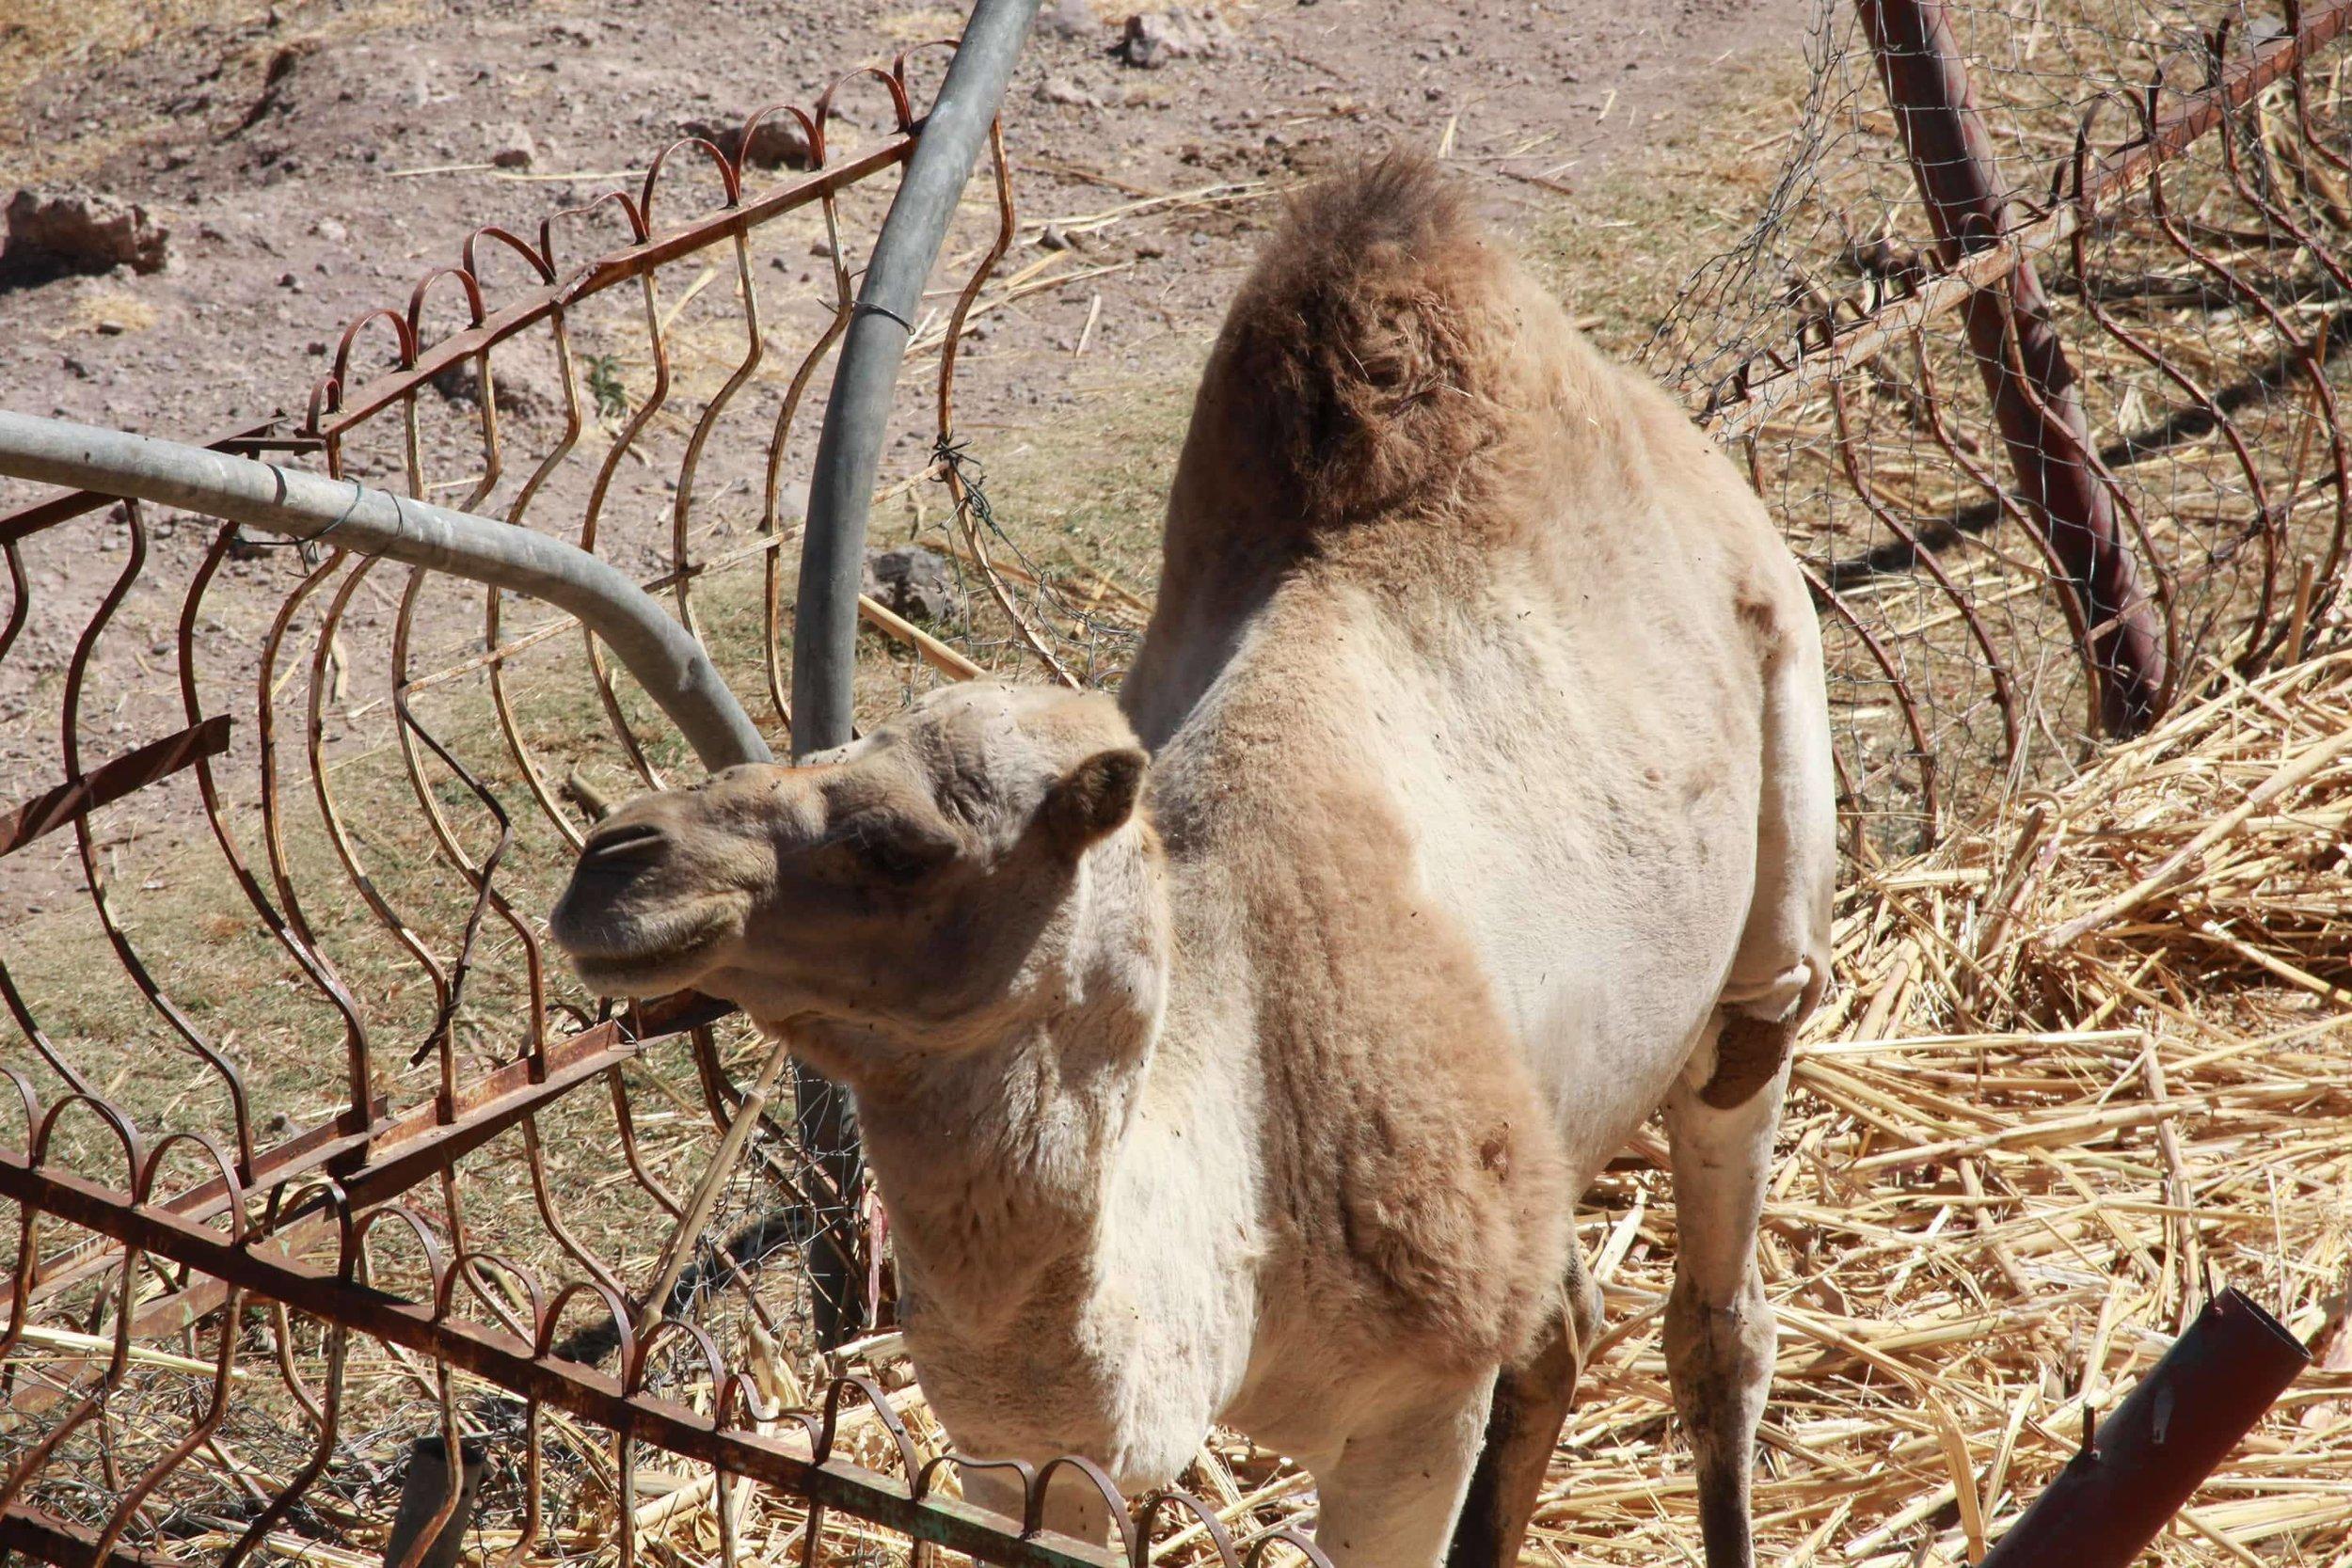 ibb zoo camel Yemen OWAP AR salman pic today 20 dec 2017.jpg